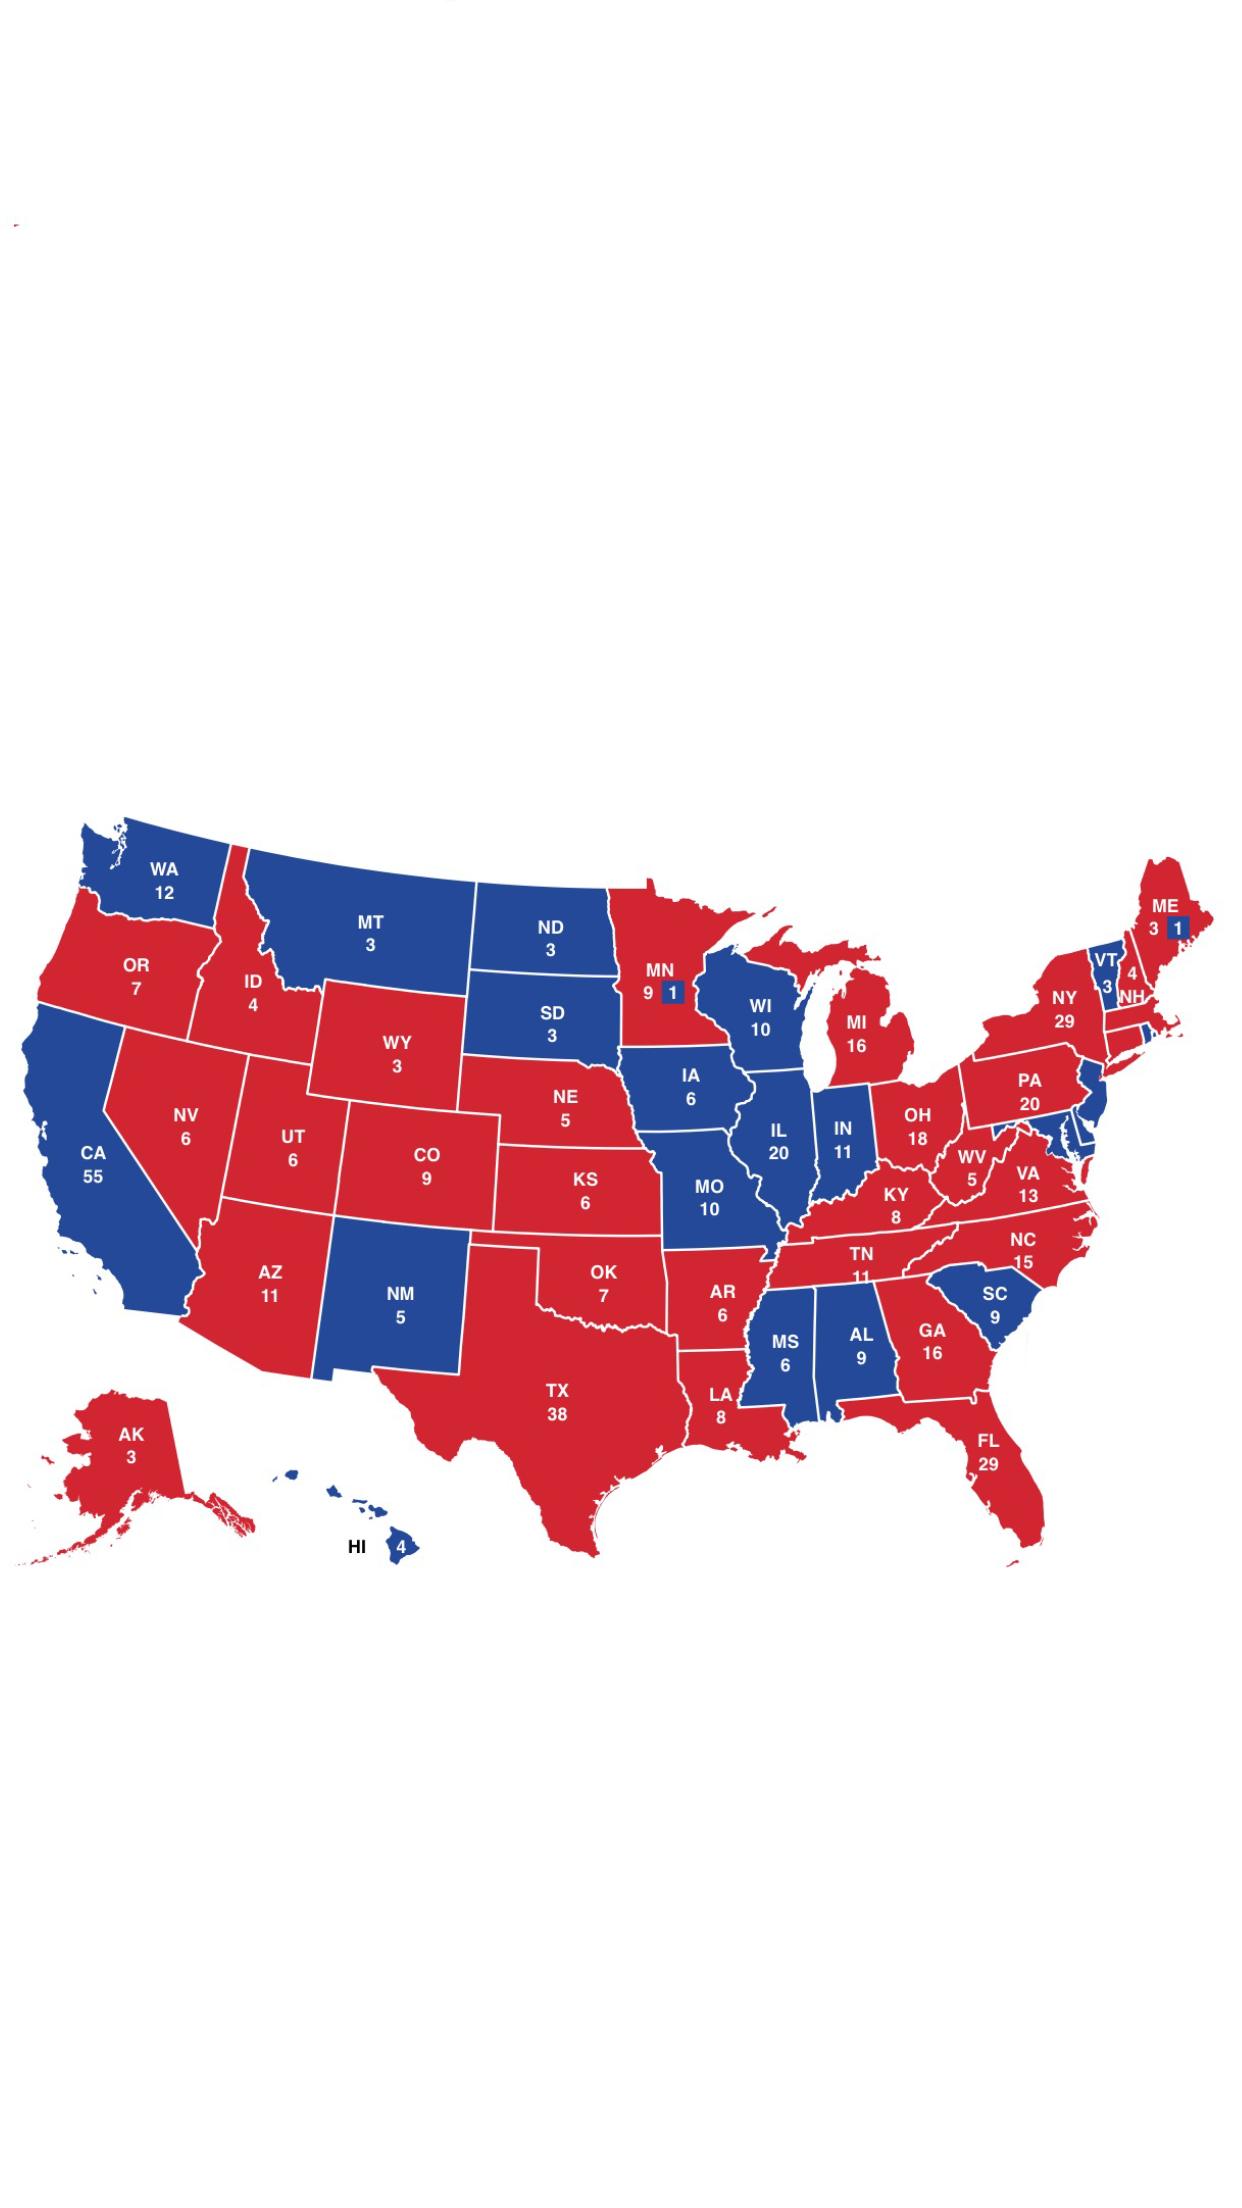 Image United States election 2020 map Future